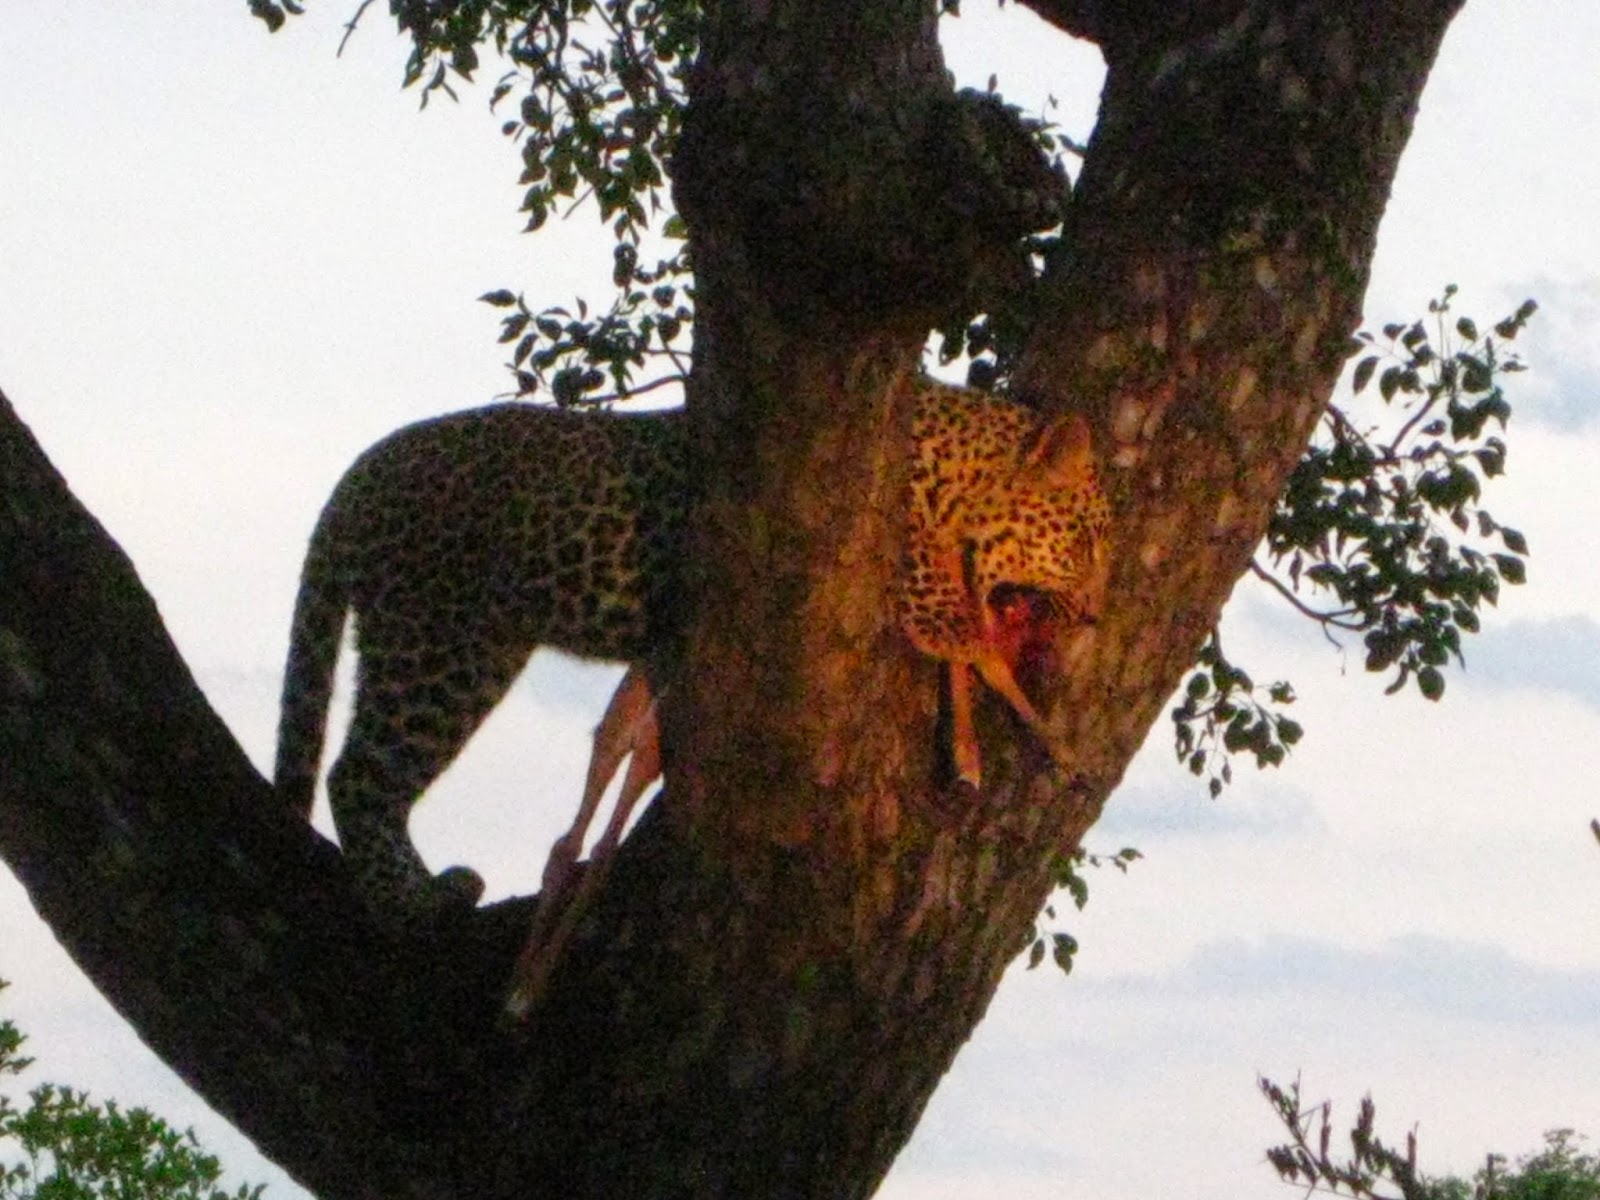 Sabi Sands - We catch a leopard feeding on an impala in a tree